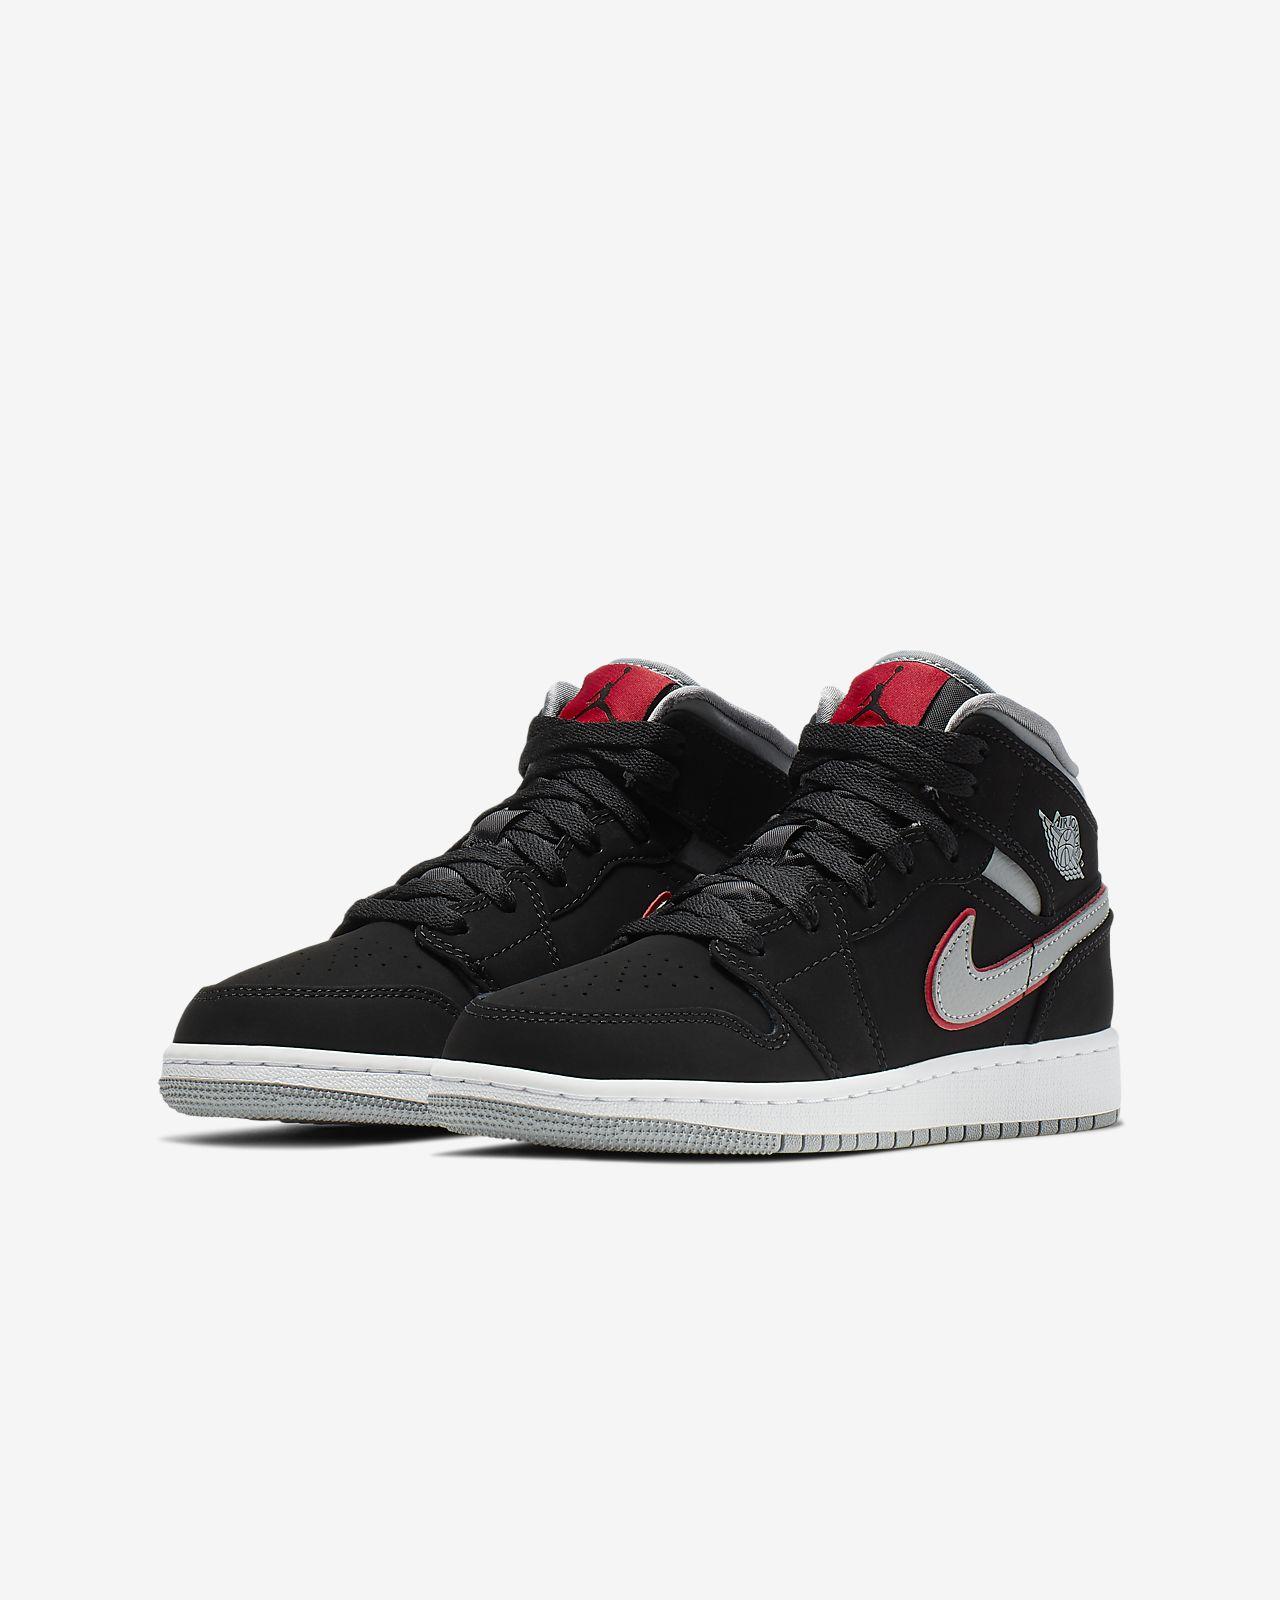 3c206cb05dbc88 Air Jordan 1 Mid Big Kids  Shoe. Nike.com